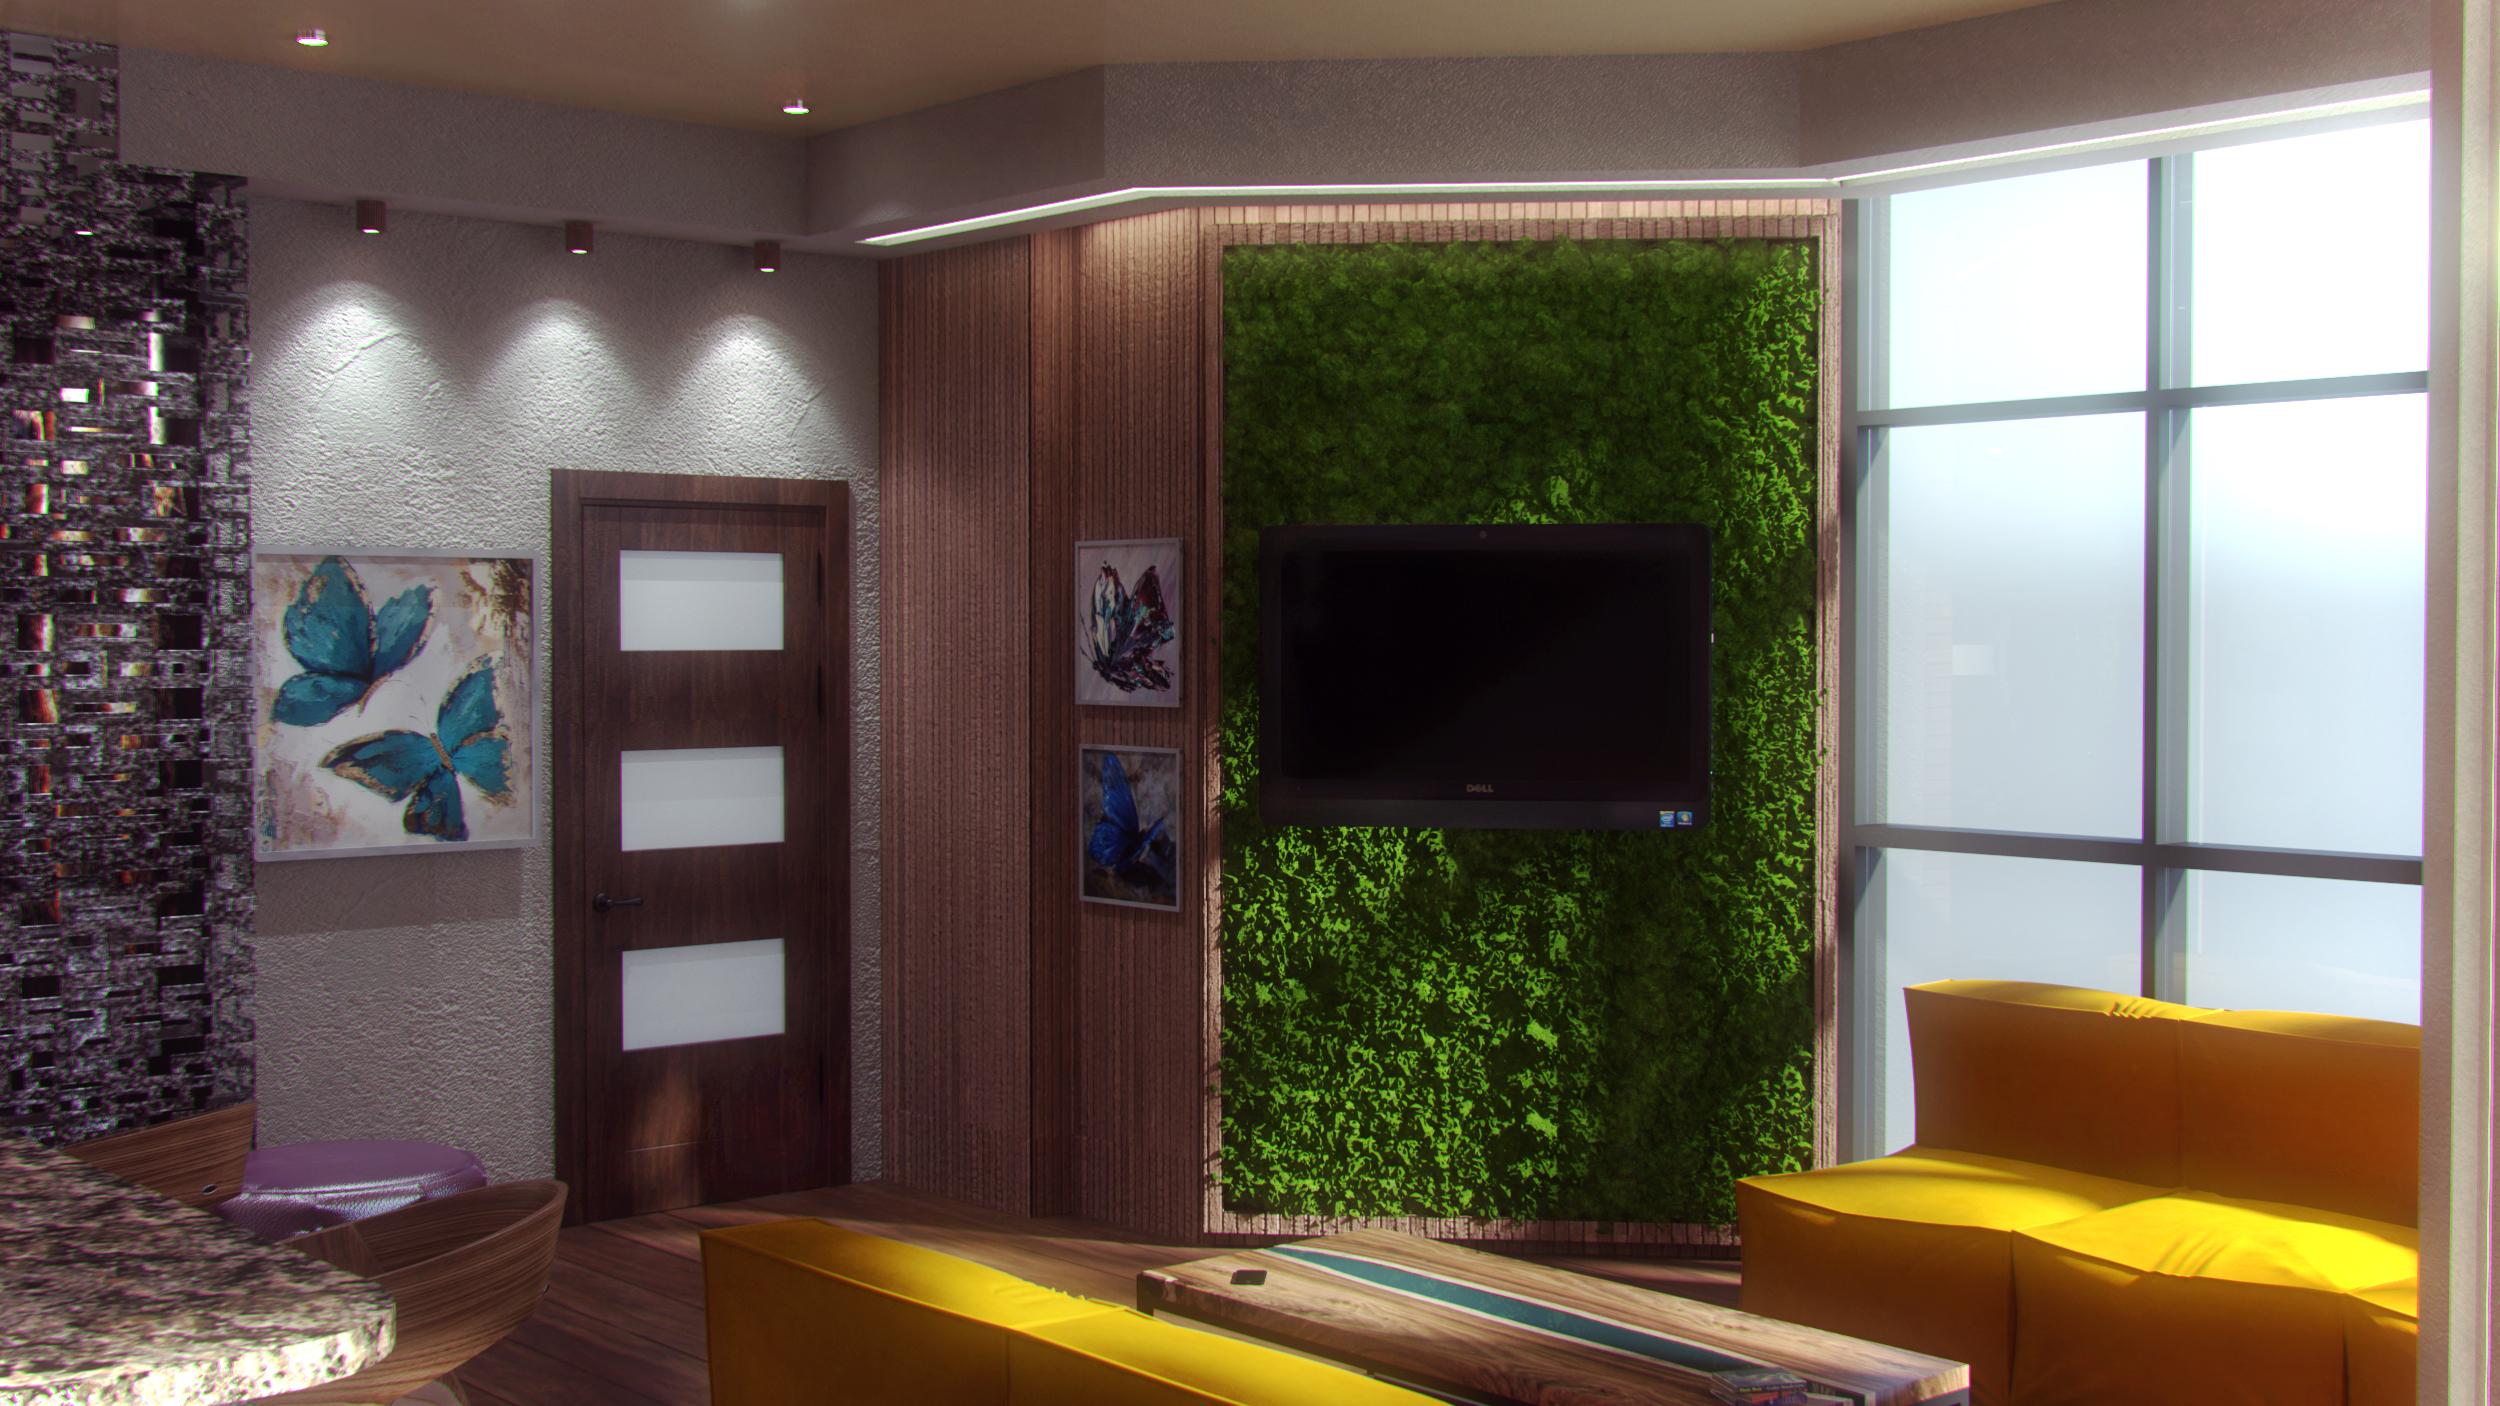 Interior in 3d max vray 3.0 image